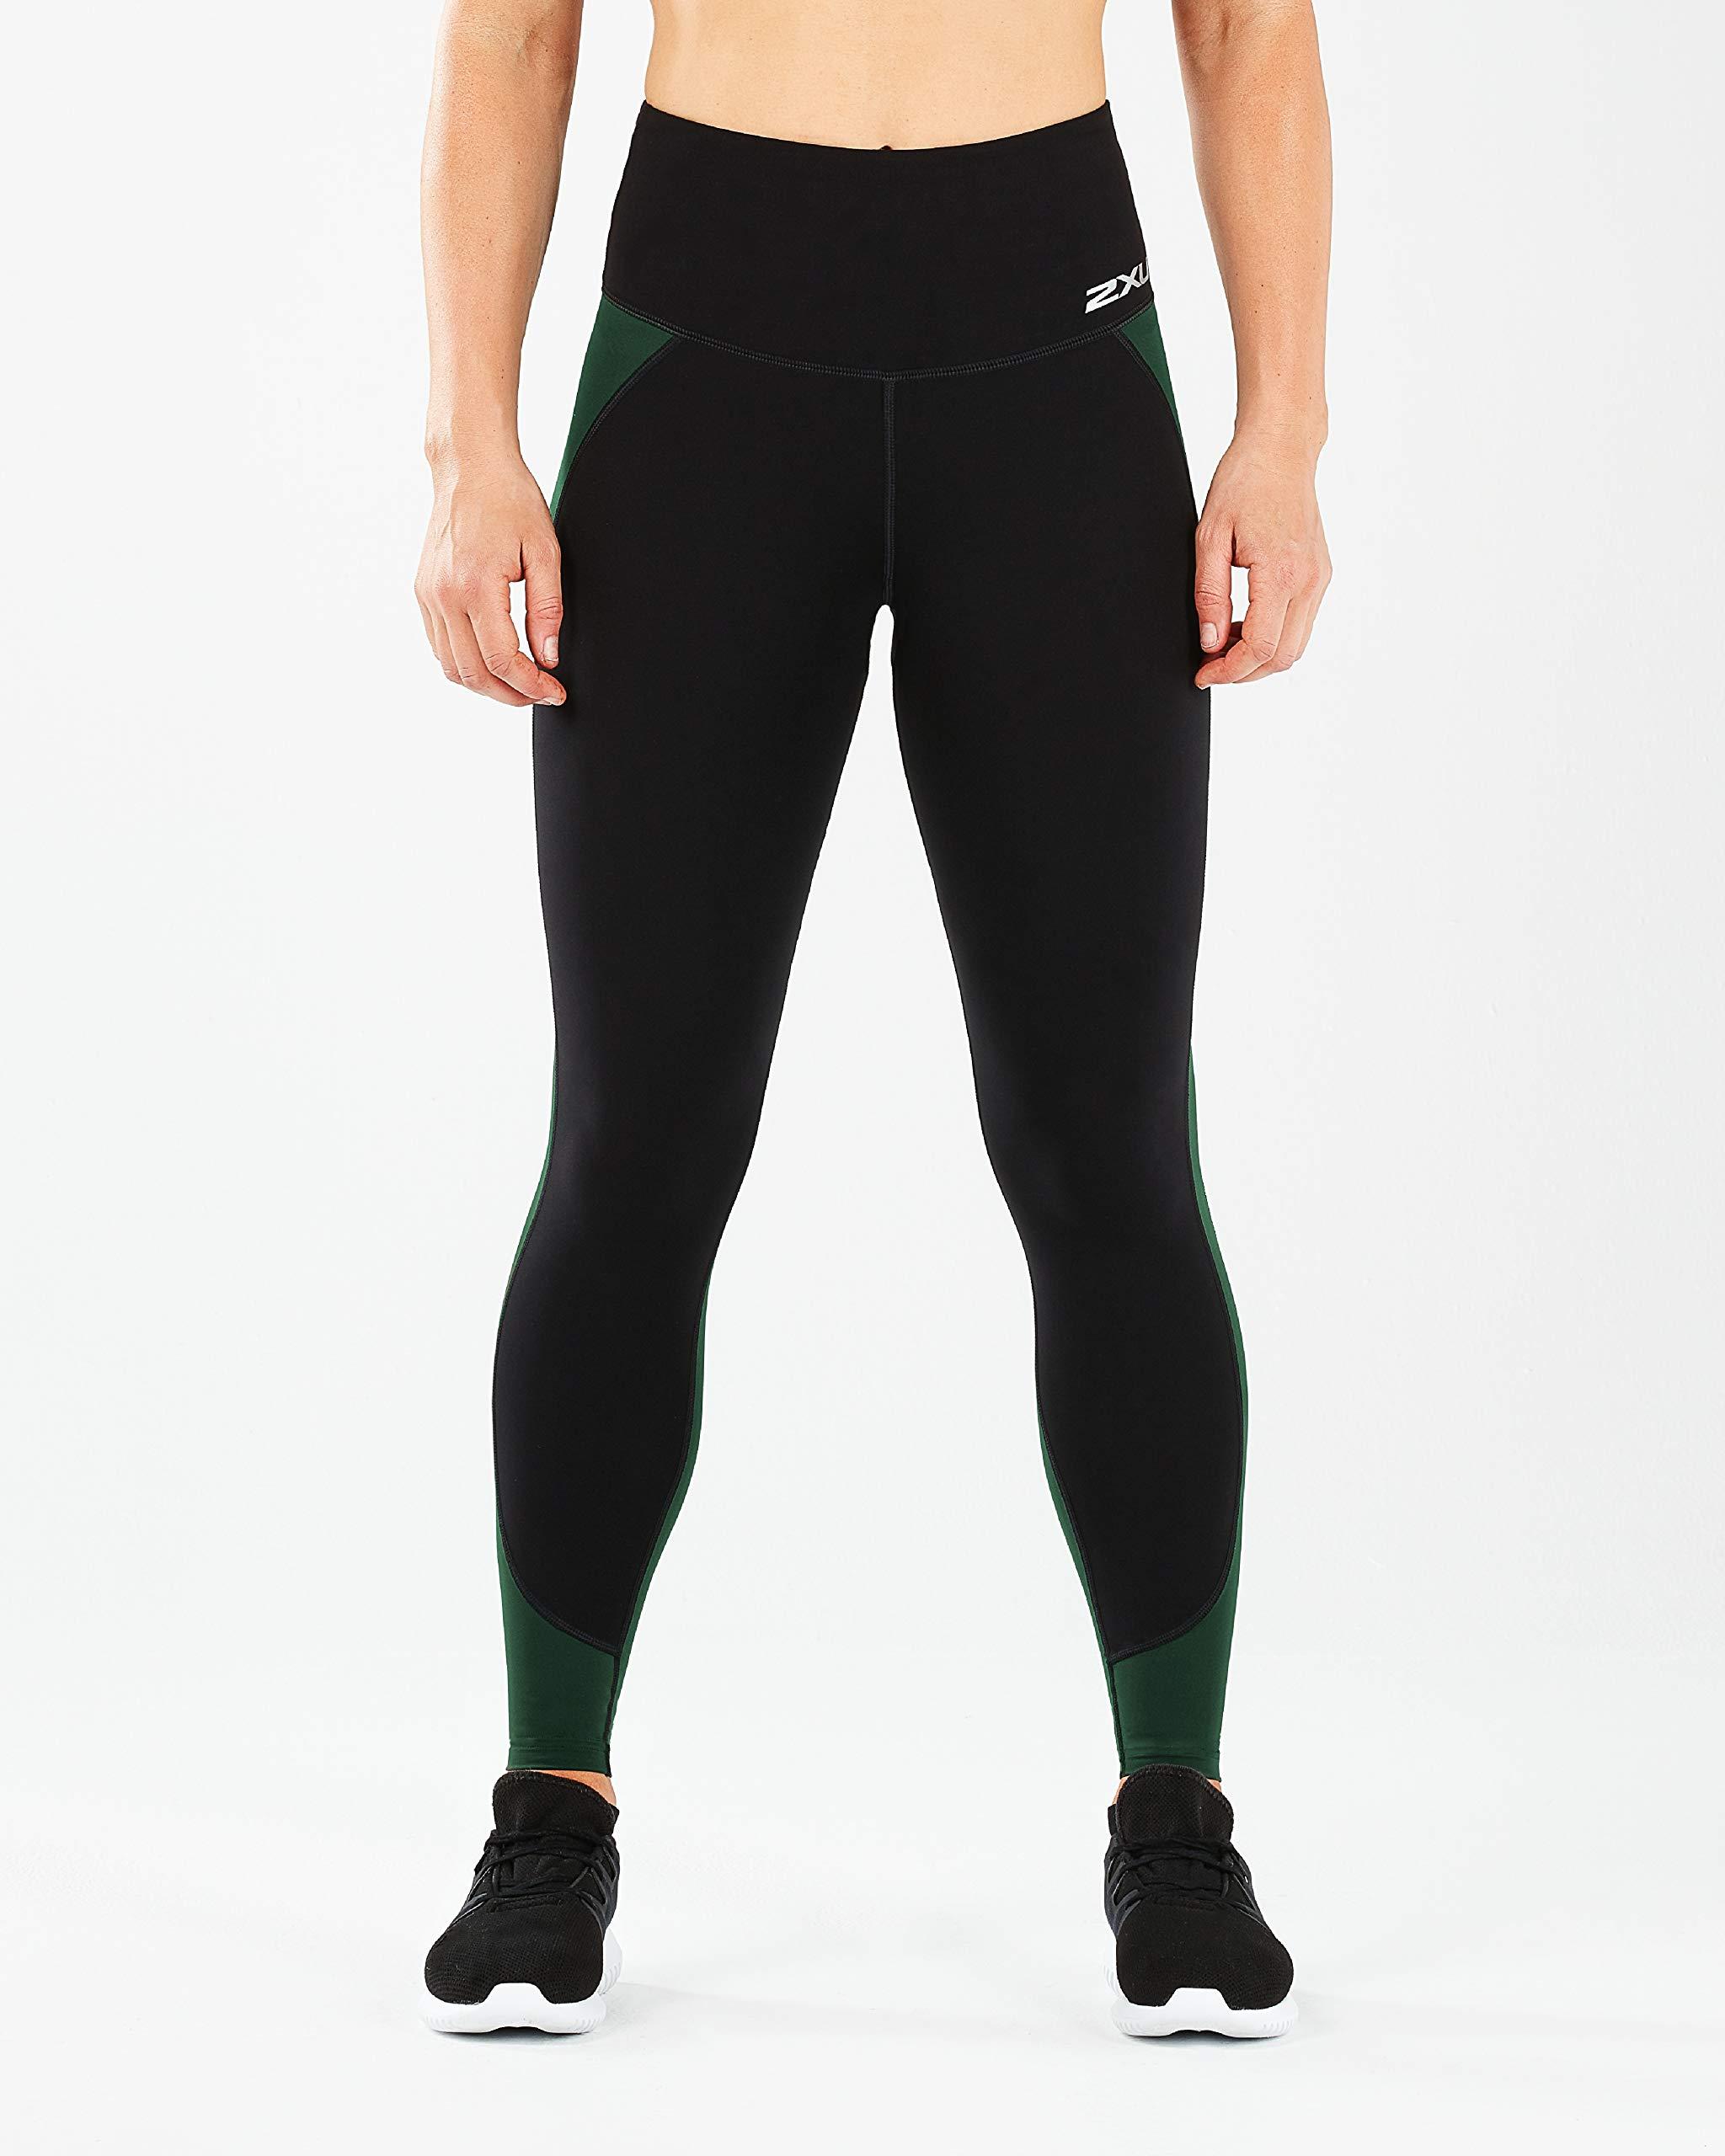 2XU Women's Fitness Hi-Rise Comp Tights, Black/Mountain View, XL-R by 2XU